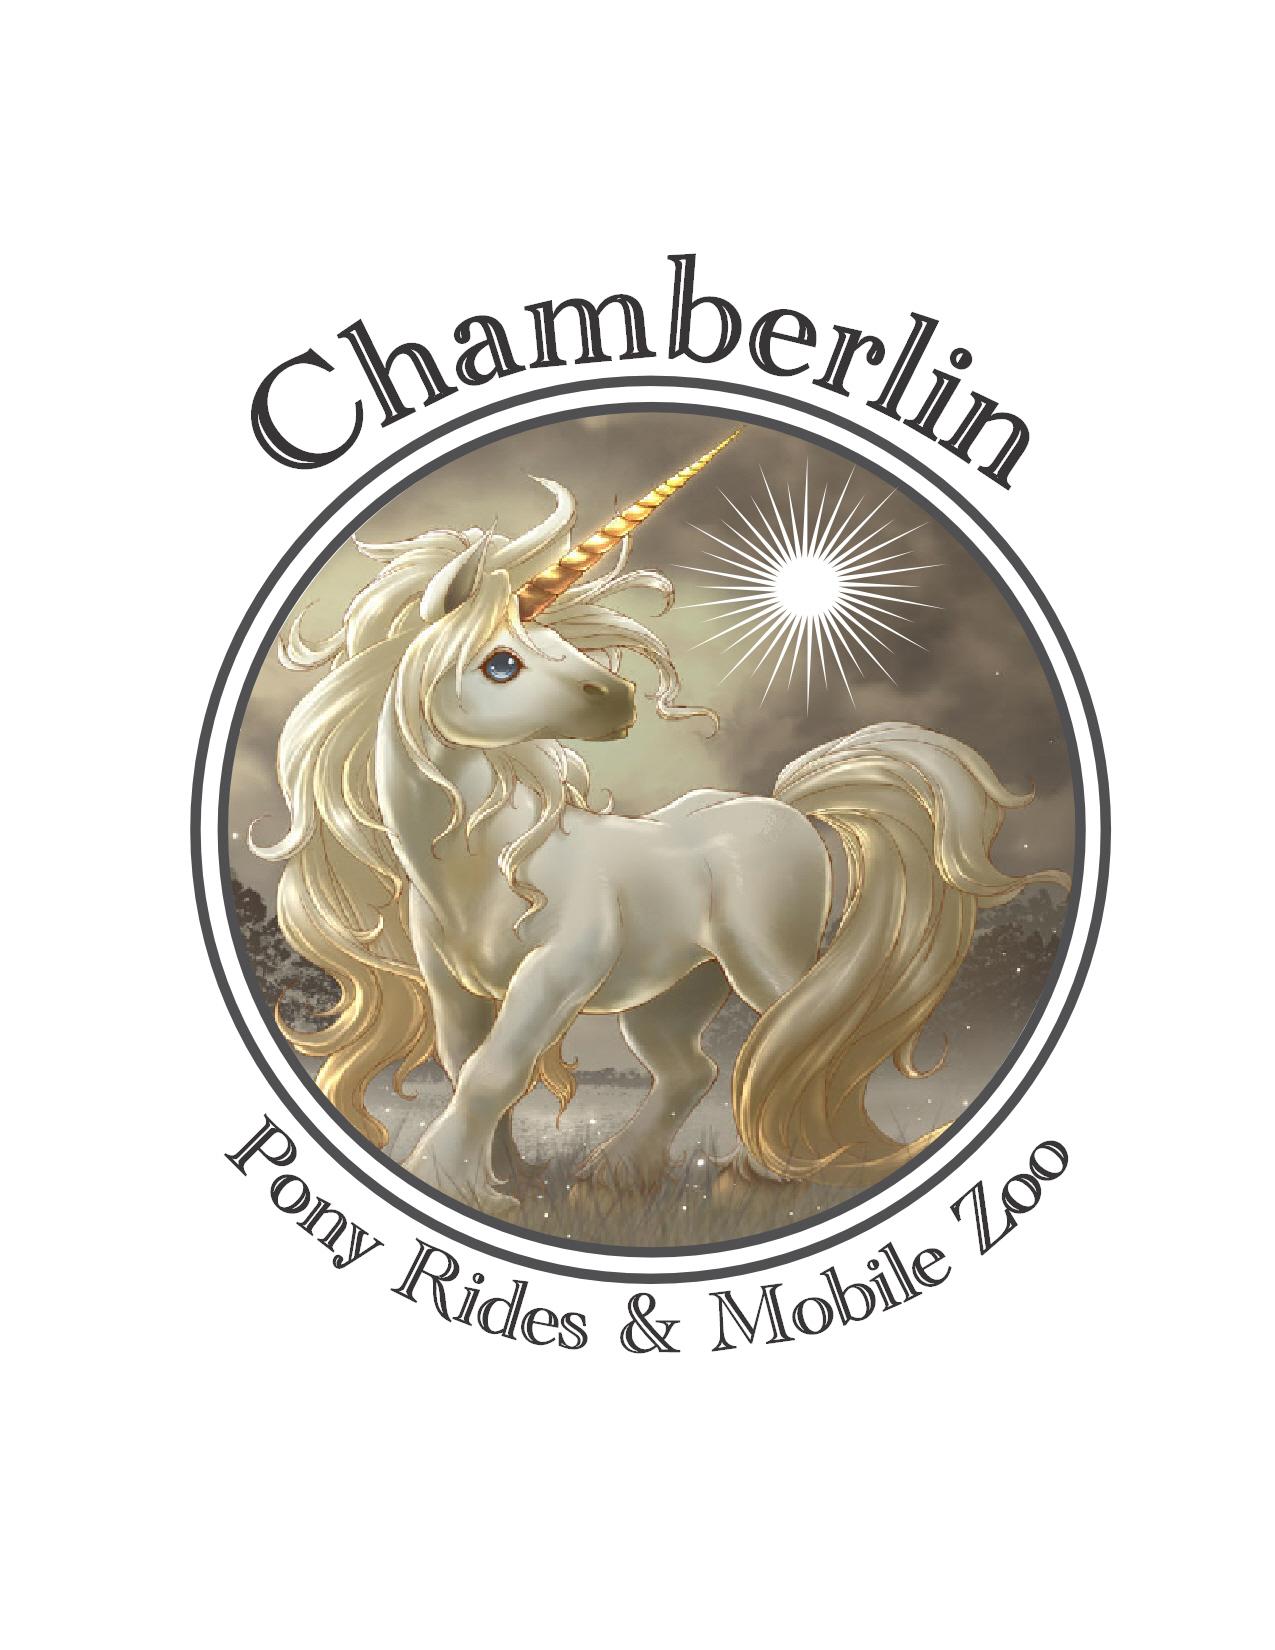 Chamberlin Pony Rides & Mobile Petting Zoo LLC